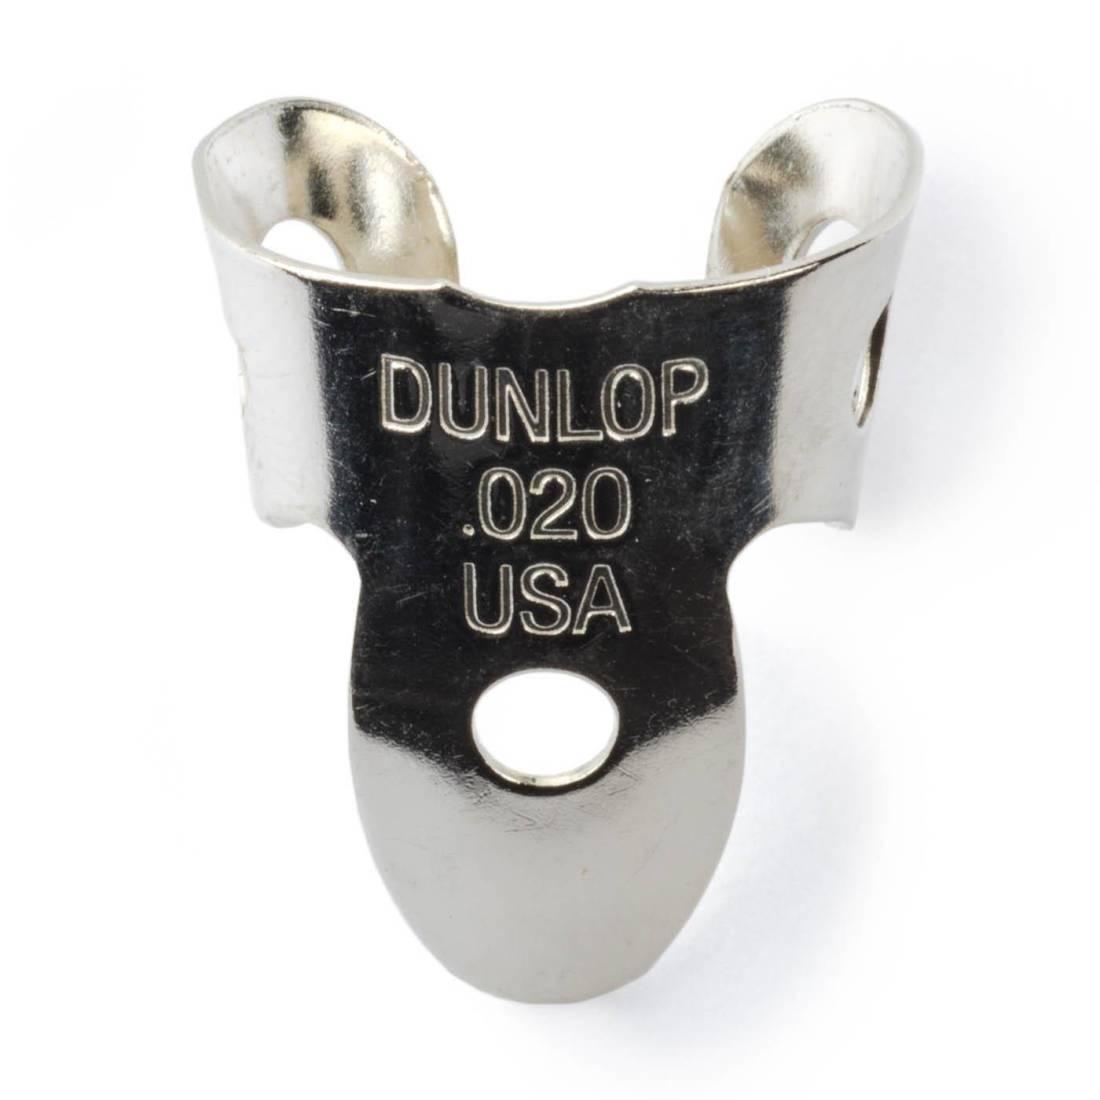 Dunlop Thumb Picks  12 Pack  Ultex Gold  Large  Guitar and Banjo